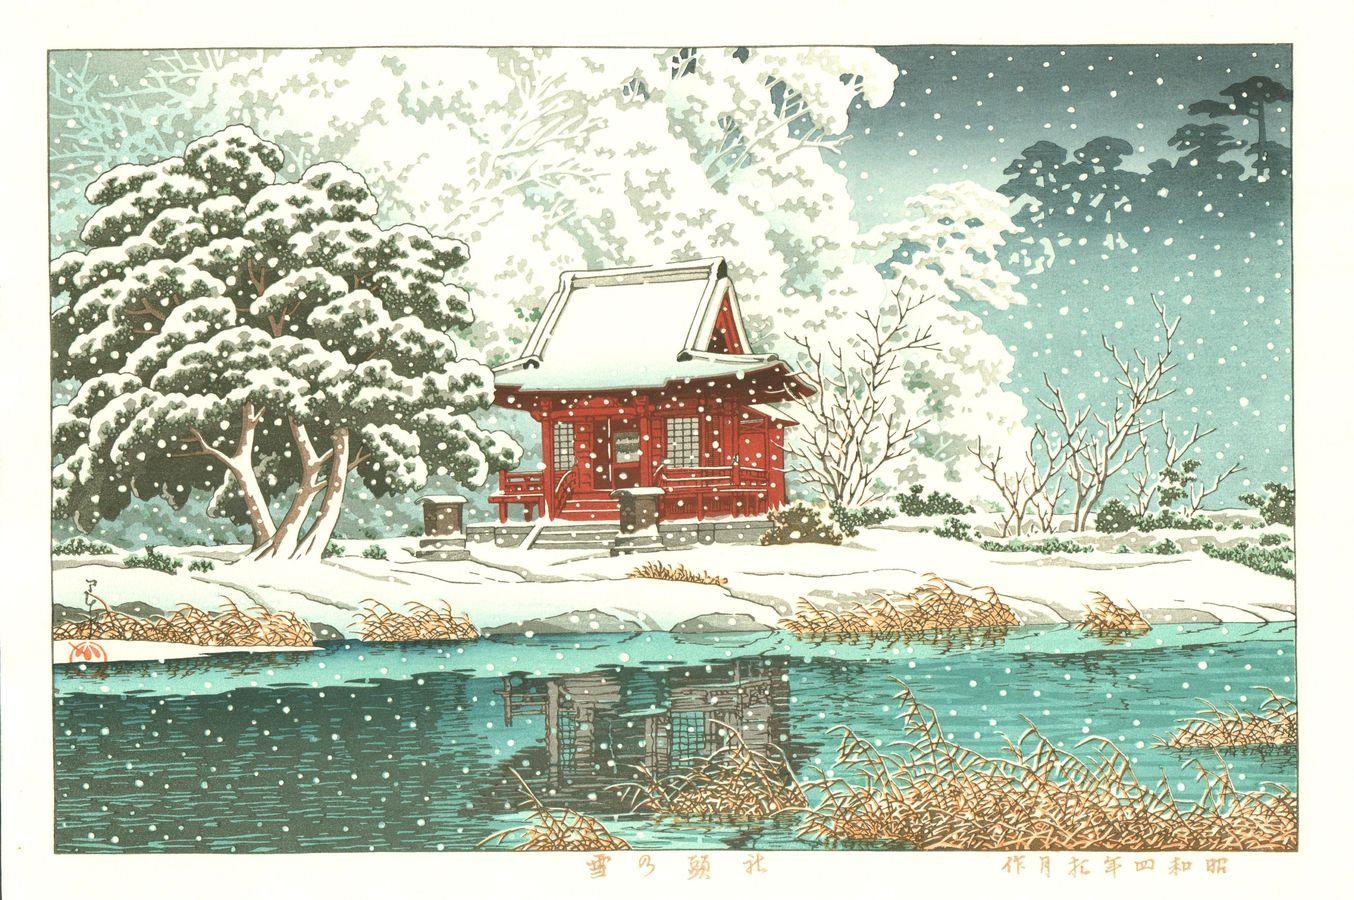 Hasui Kawase 1929 - Neige a l entre du sanctuaire de Benten - Editeurs Kawaguchi et Sakai puis Shobisha.